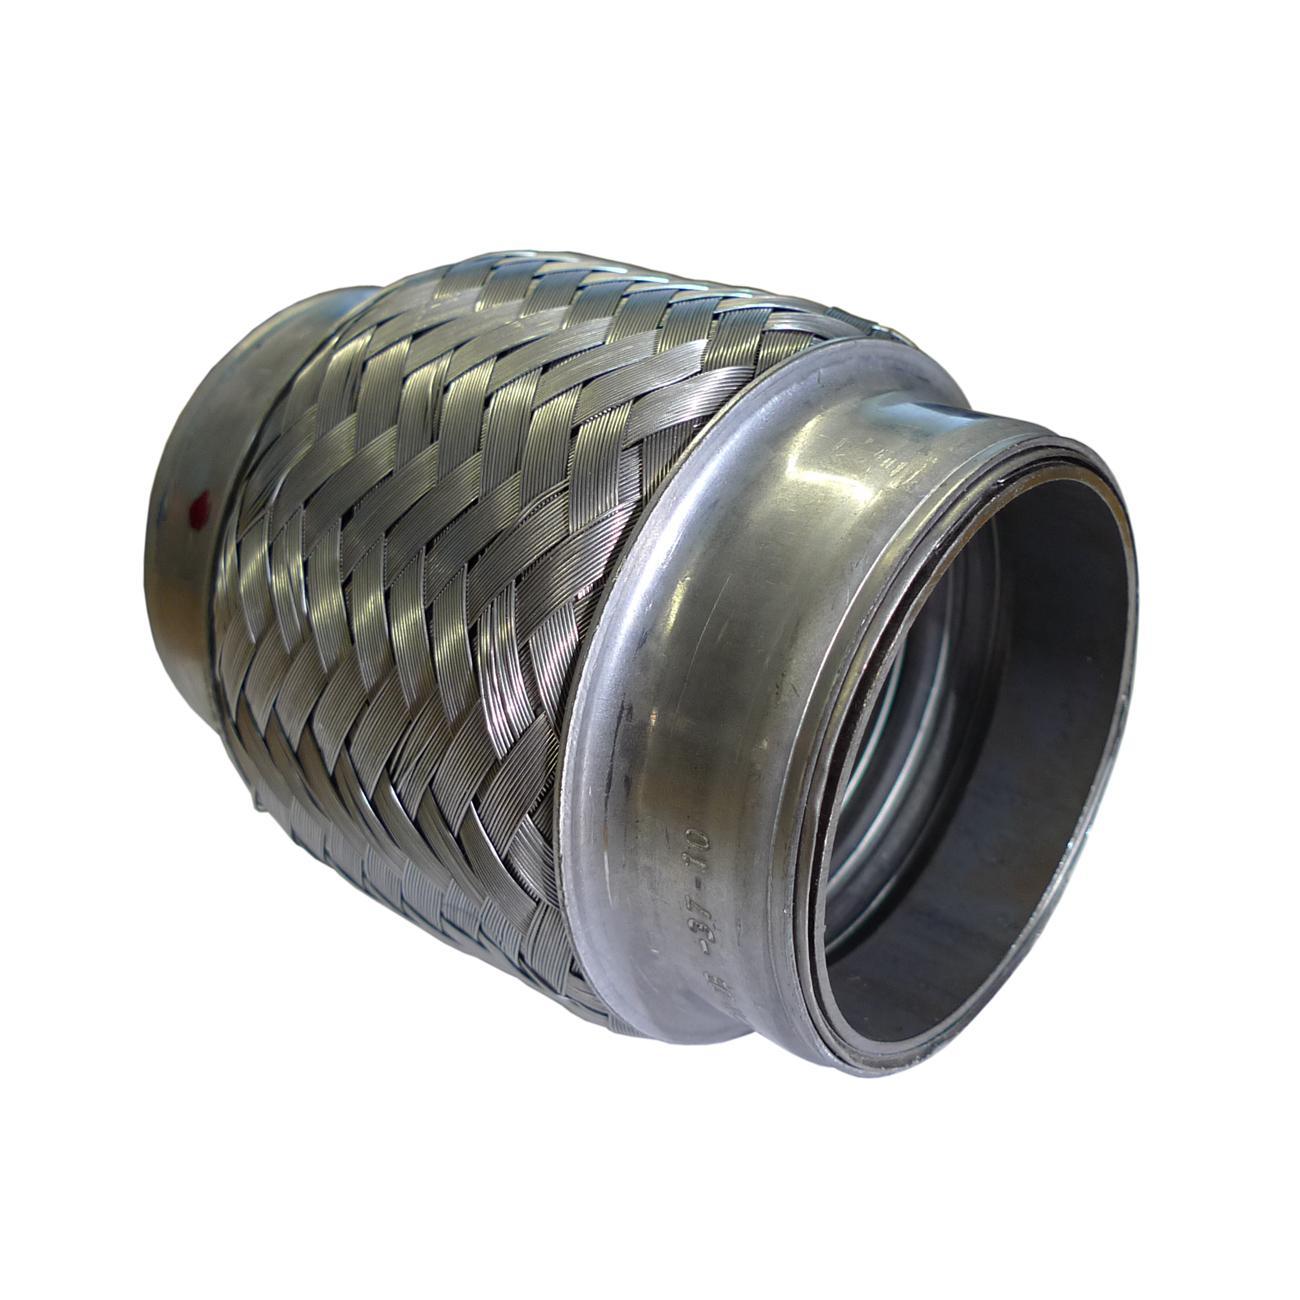 Flexible Pipe For Bladder Lining : Iloc flexible exhaust joint inch long from merlin motorsport